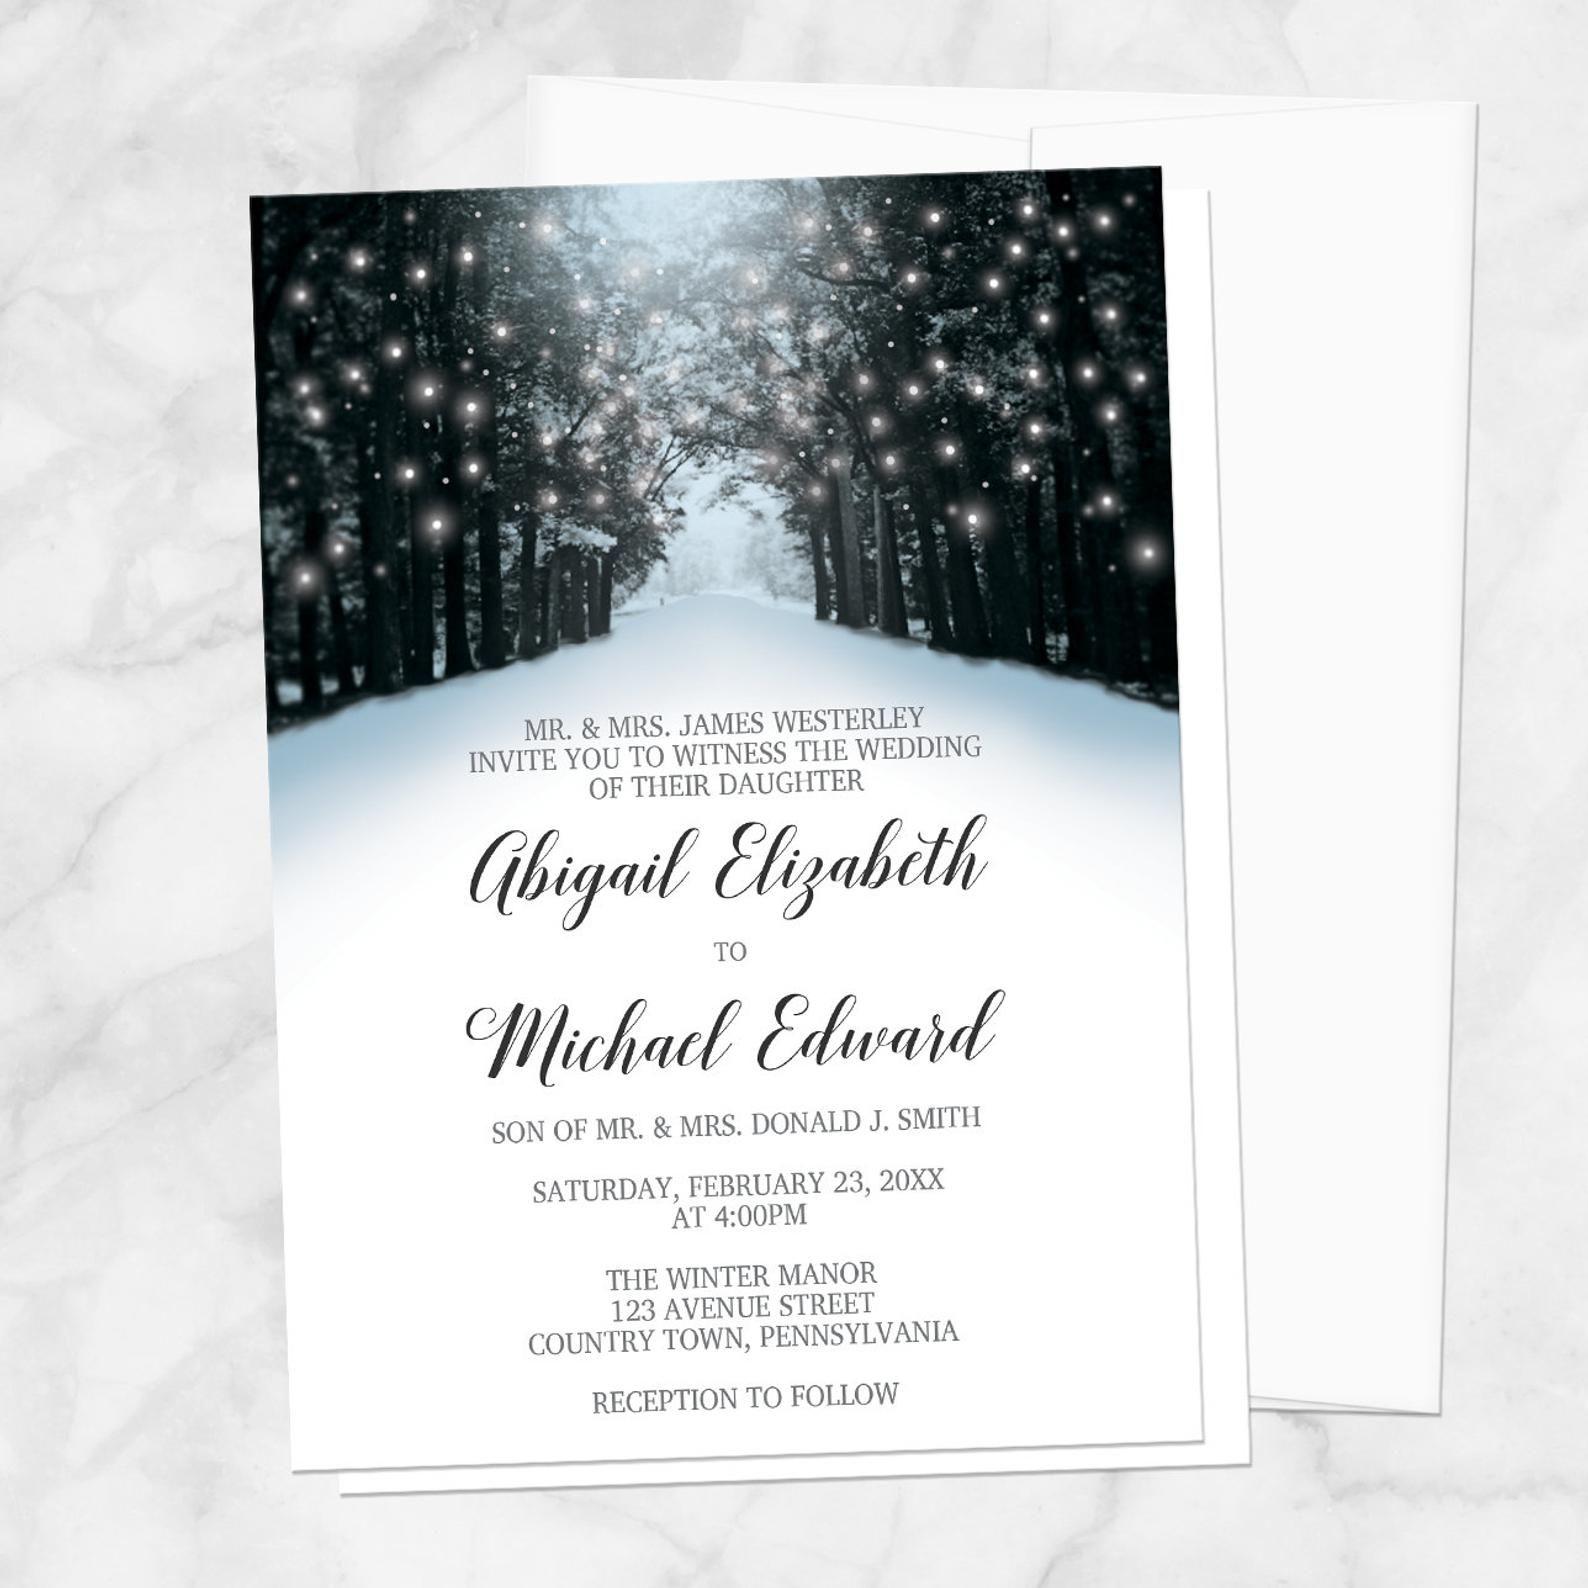 Winter Hochzeitseinladungen, Snowy Road Tree Lights – Winter Wunderland Hochzeitseinladungen – gedruckt   – Wedding Dreams